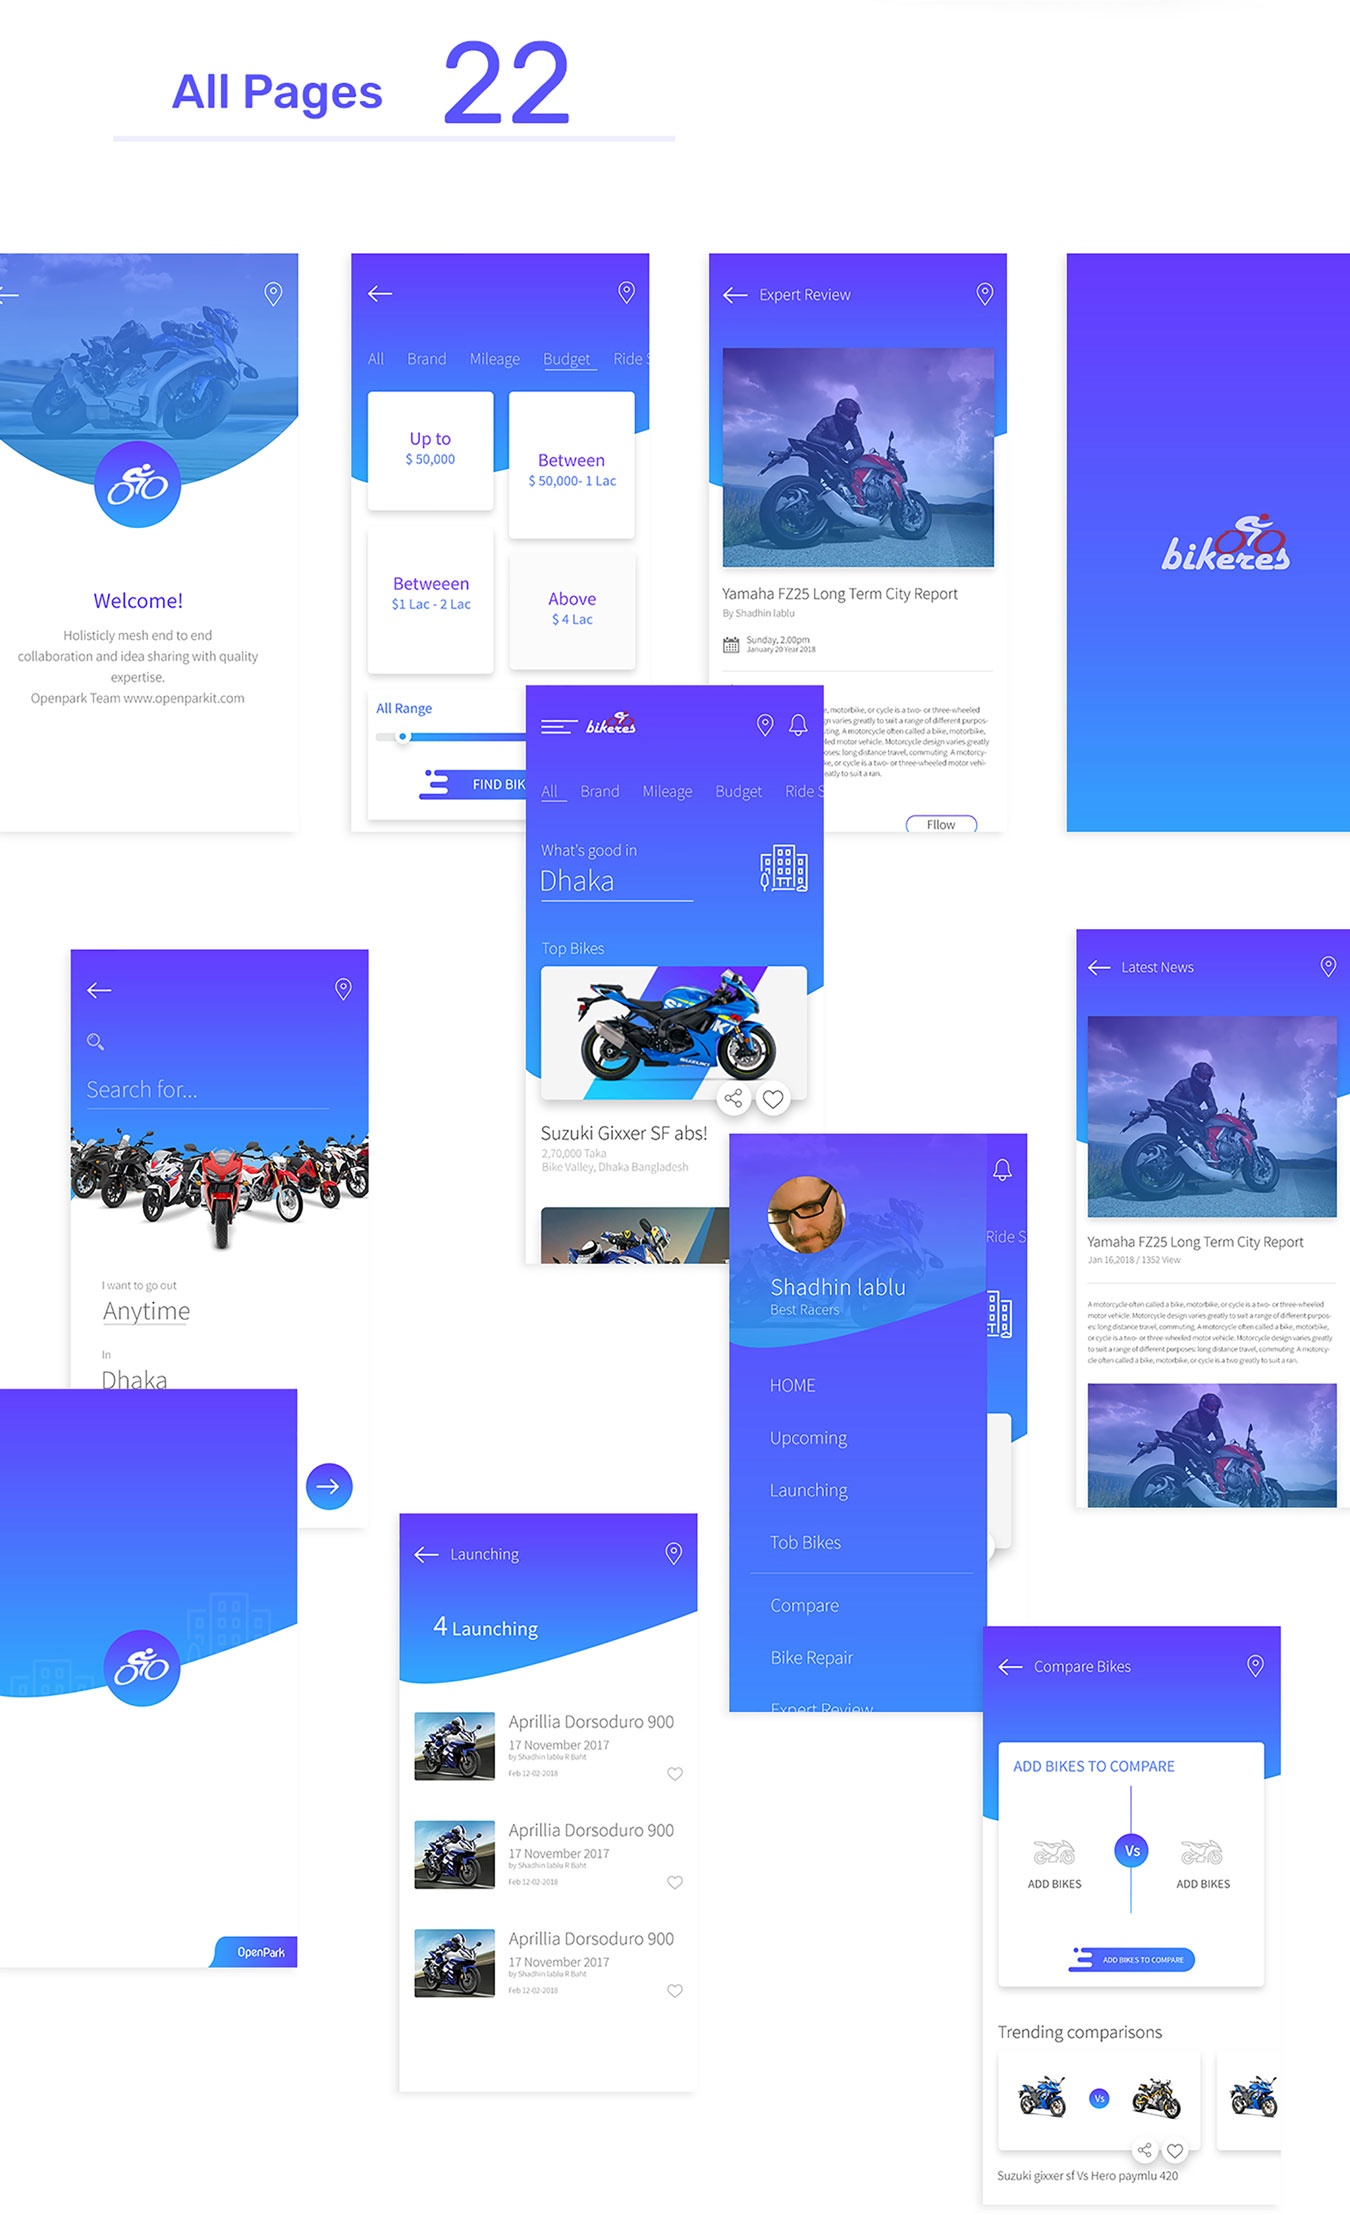 骑行Android App应用程序UI界面设计套件 Bikers App UI Kit插图(5)